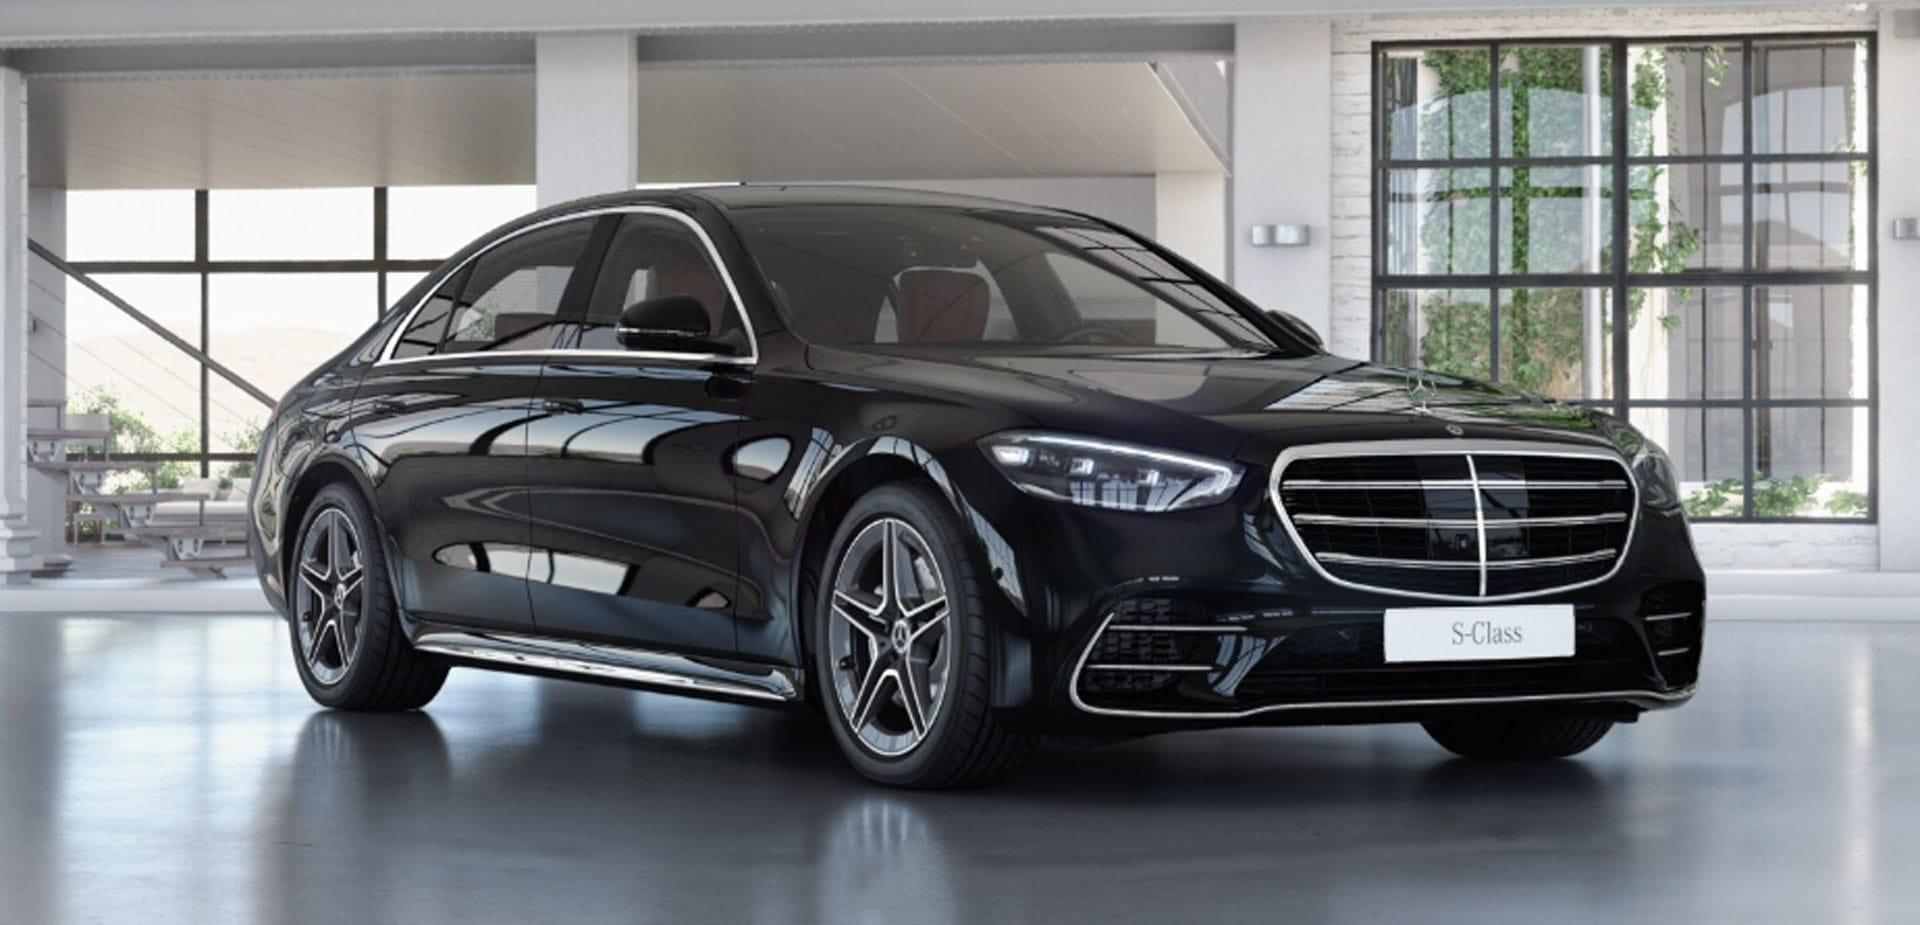 Mercedes-Benz S-Class Limousine 0152613027